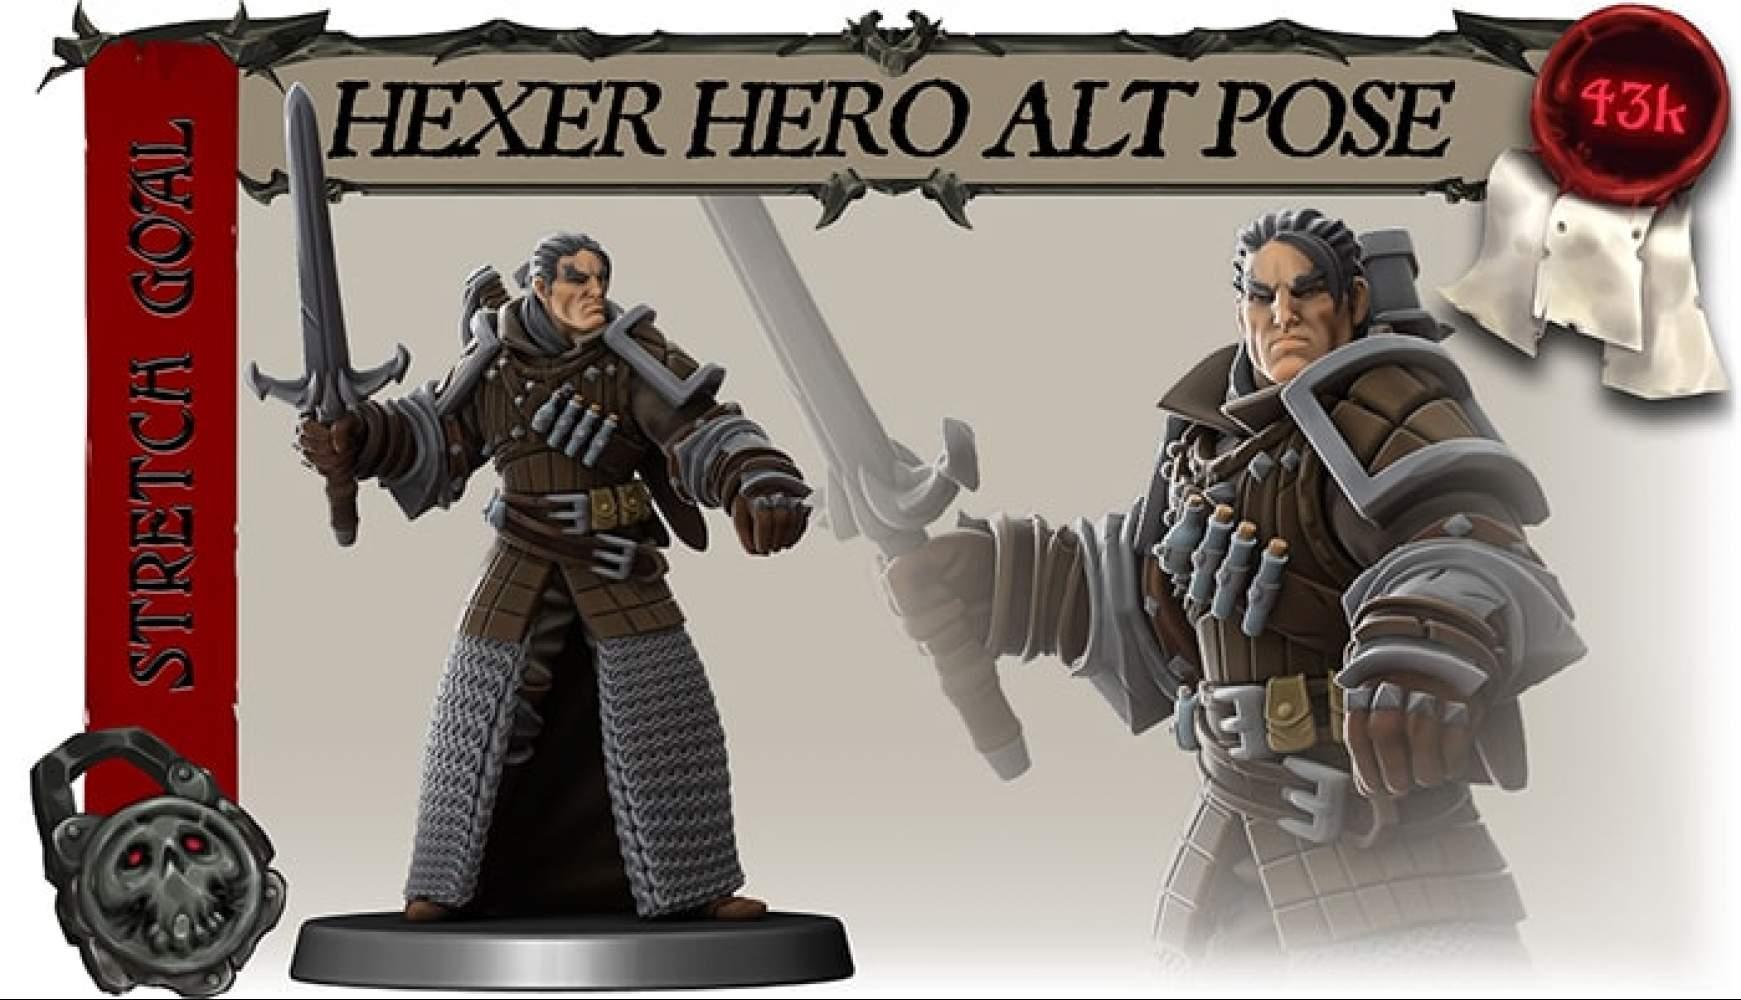 HEXER HERO ALT POSE